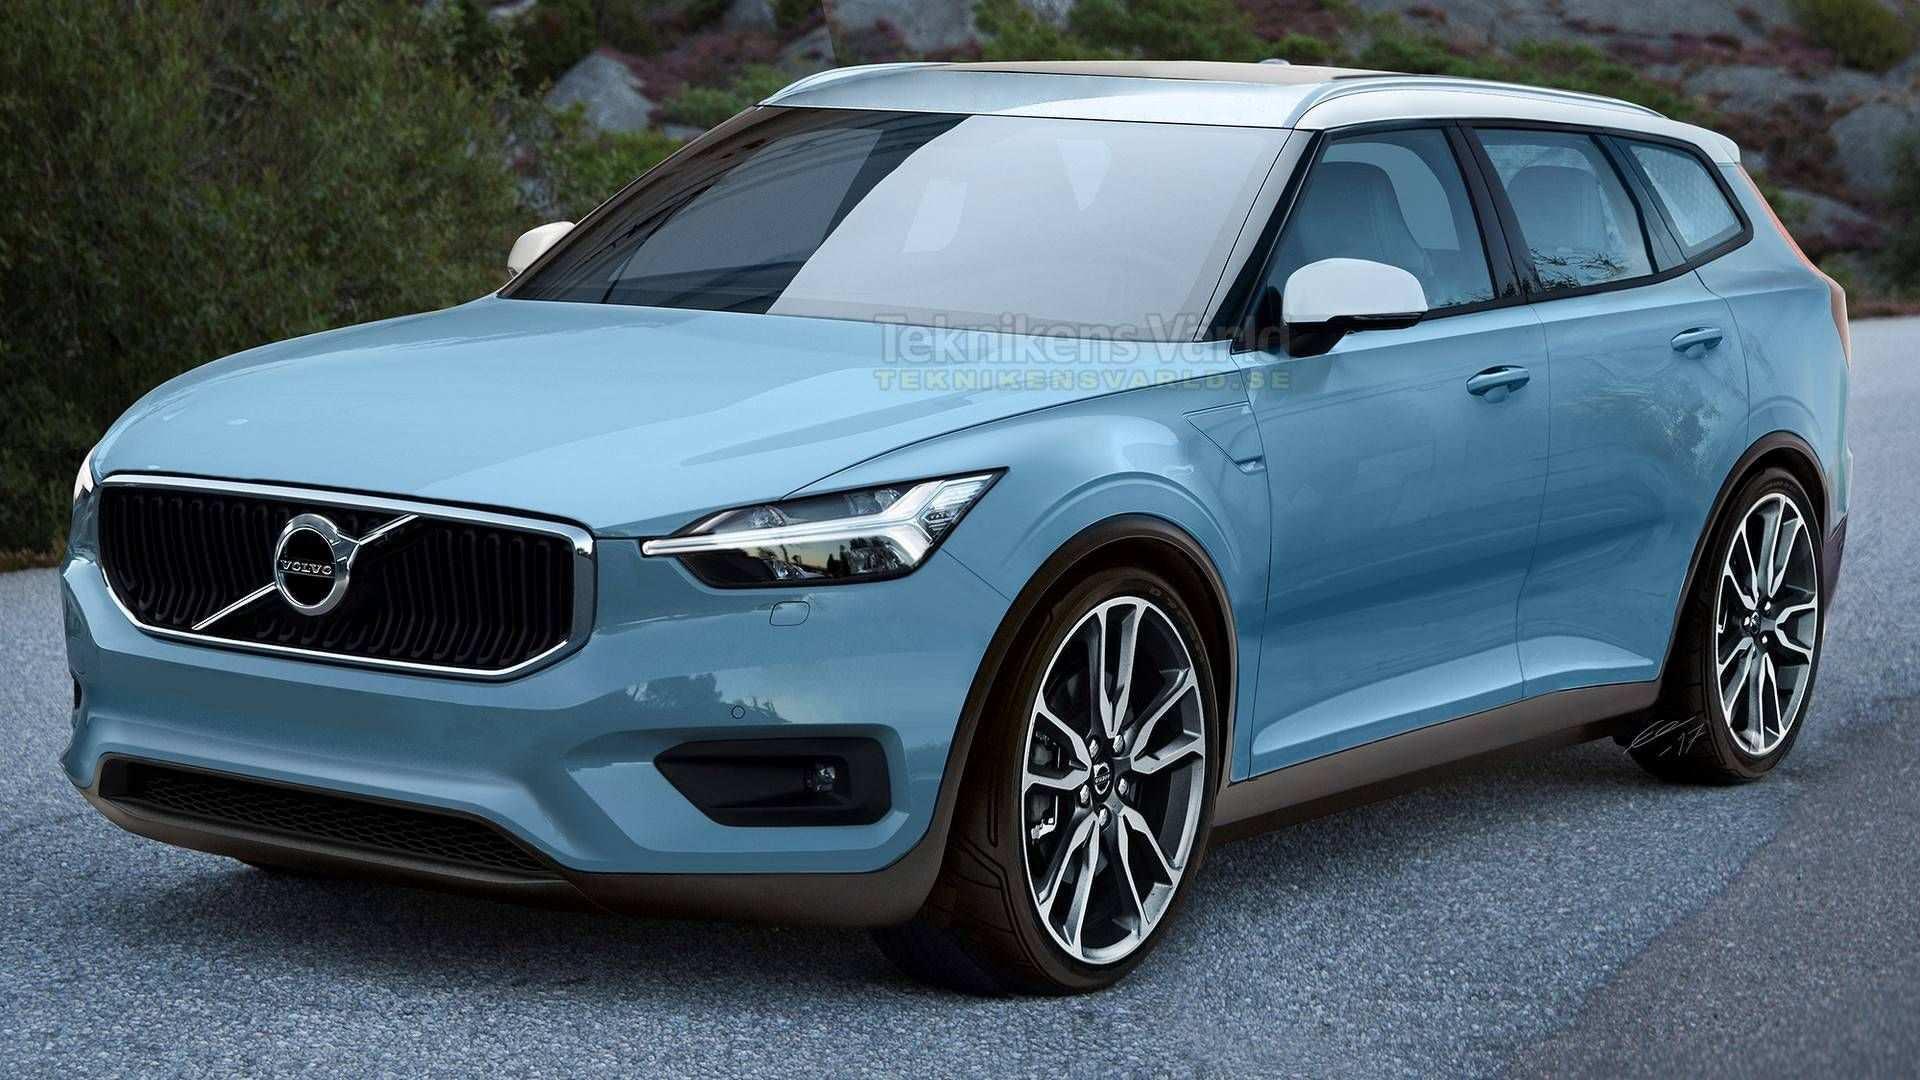 11 All New Volvo 2020 Hybrid Concept with Volvo 2020 Hybrid